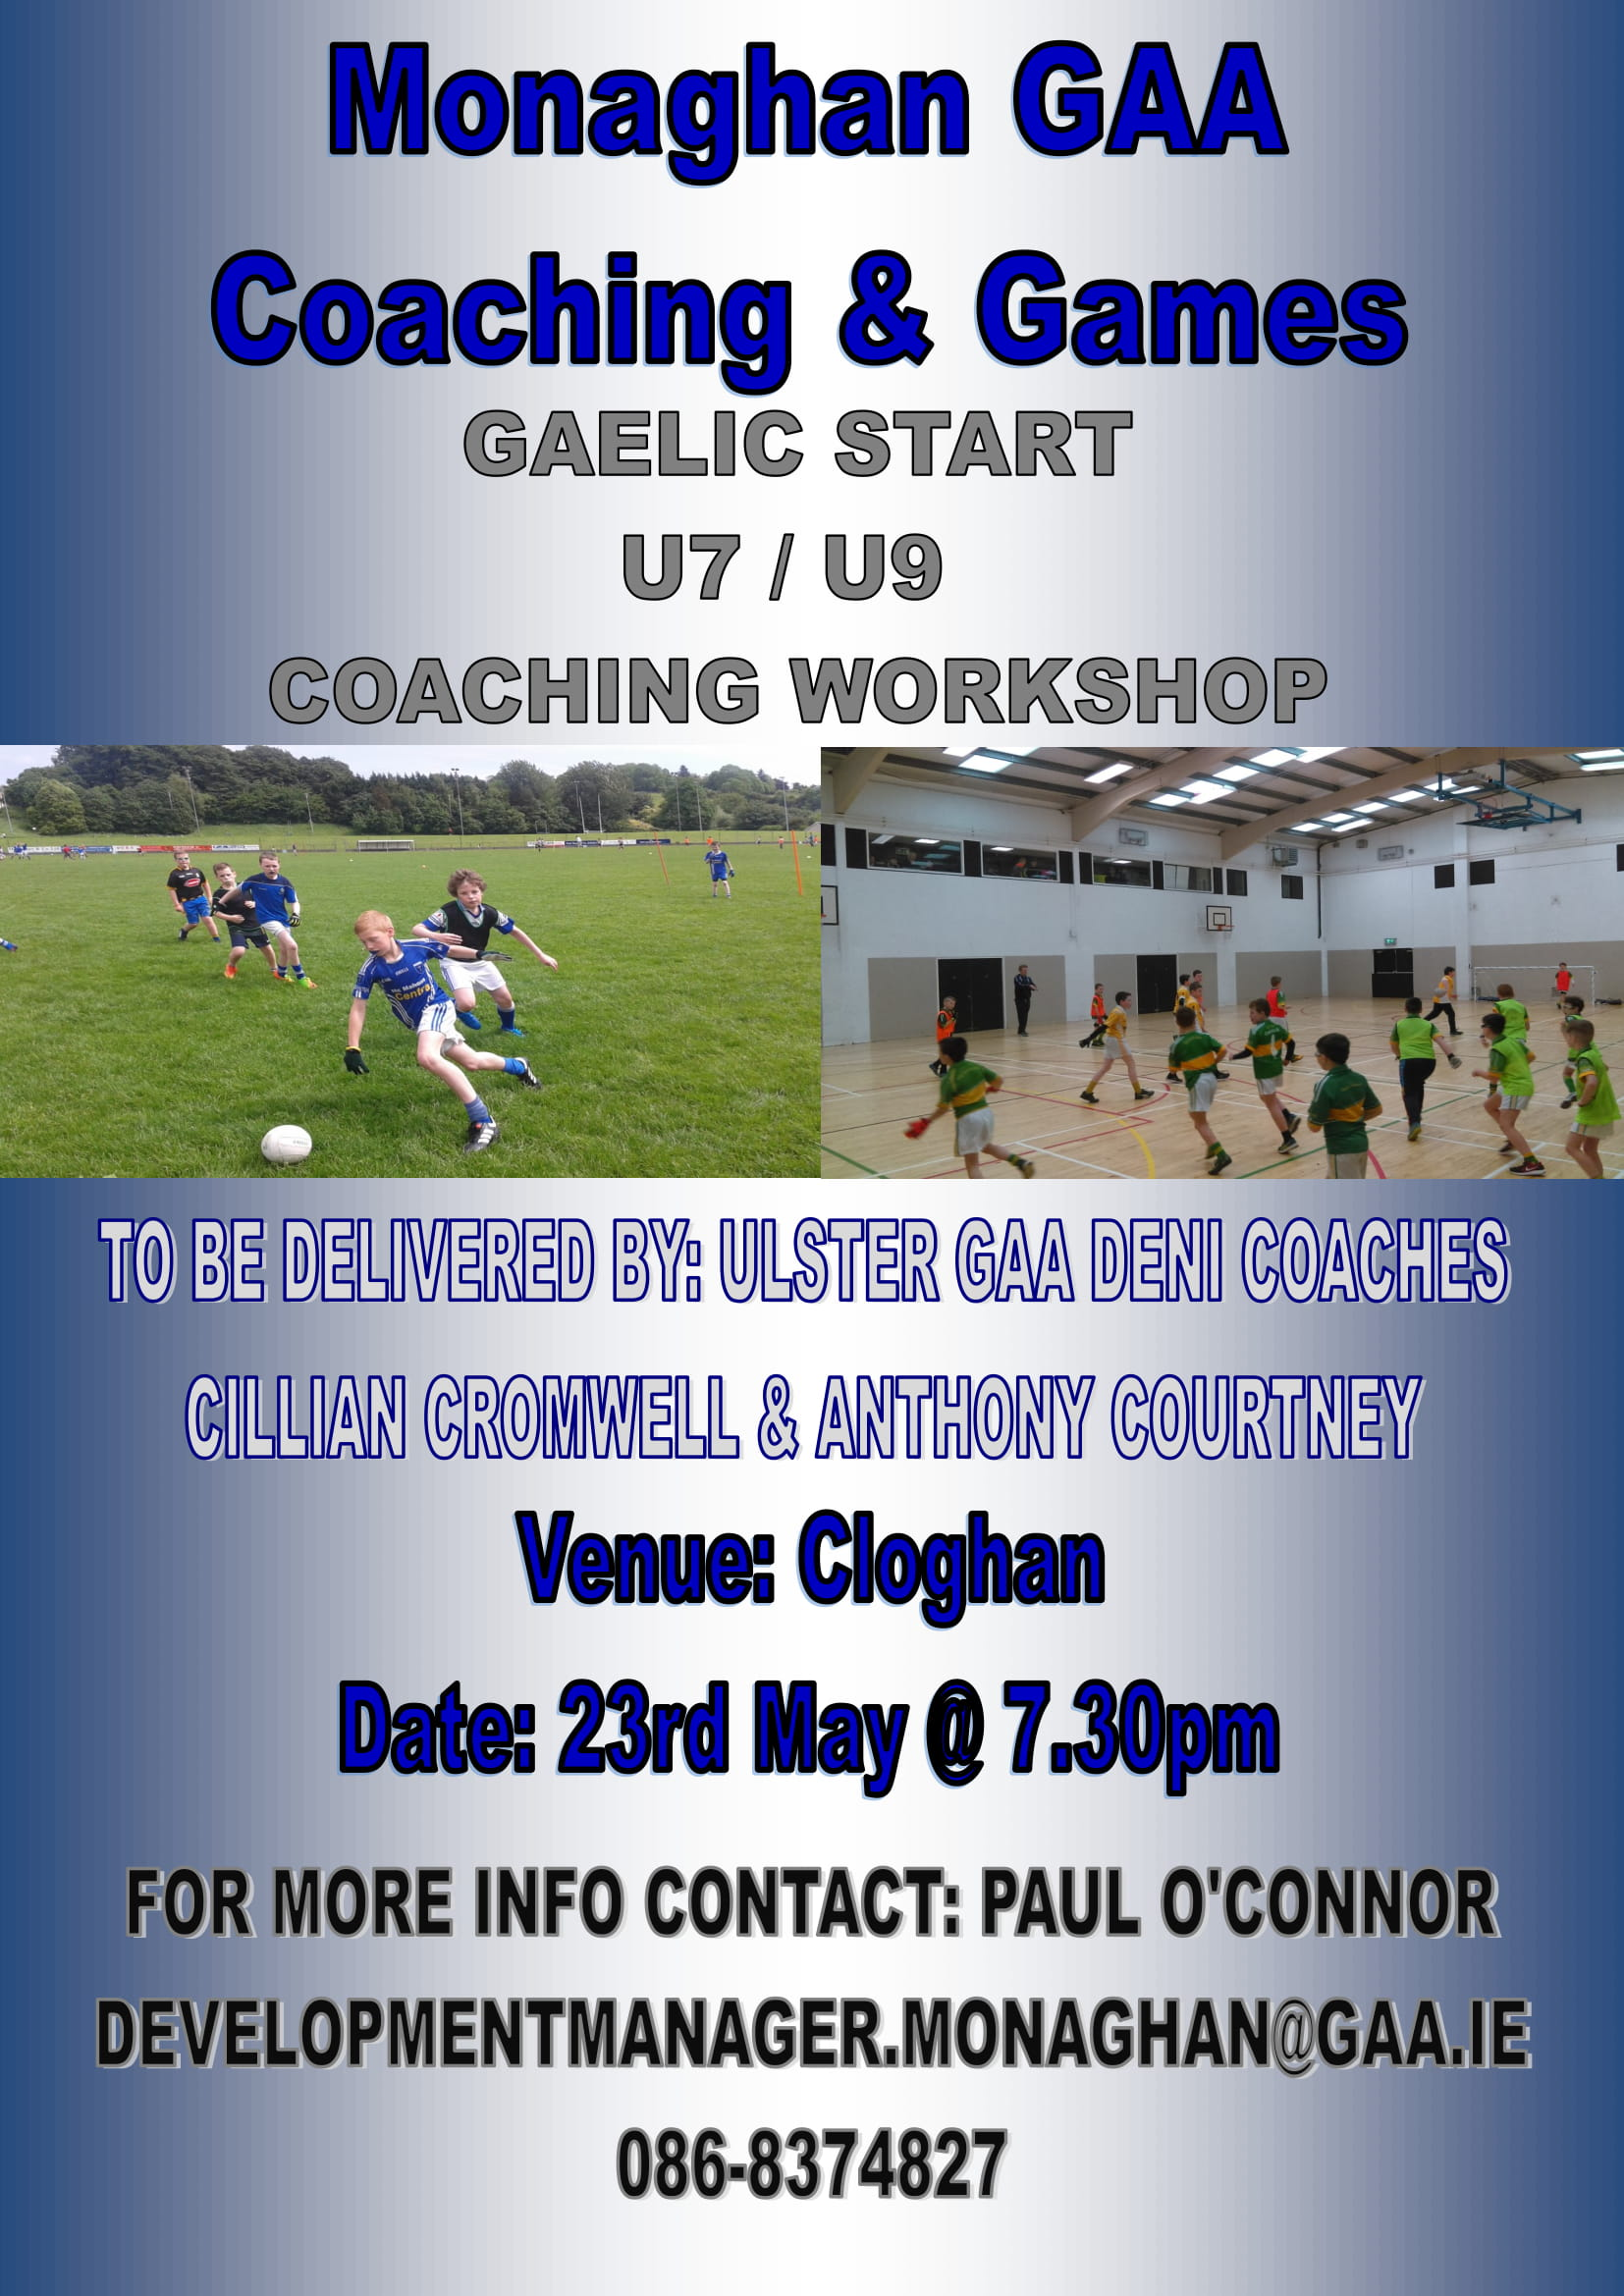 Gaelic Start Workshop – 23rd May @ Cloghan